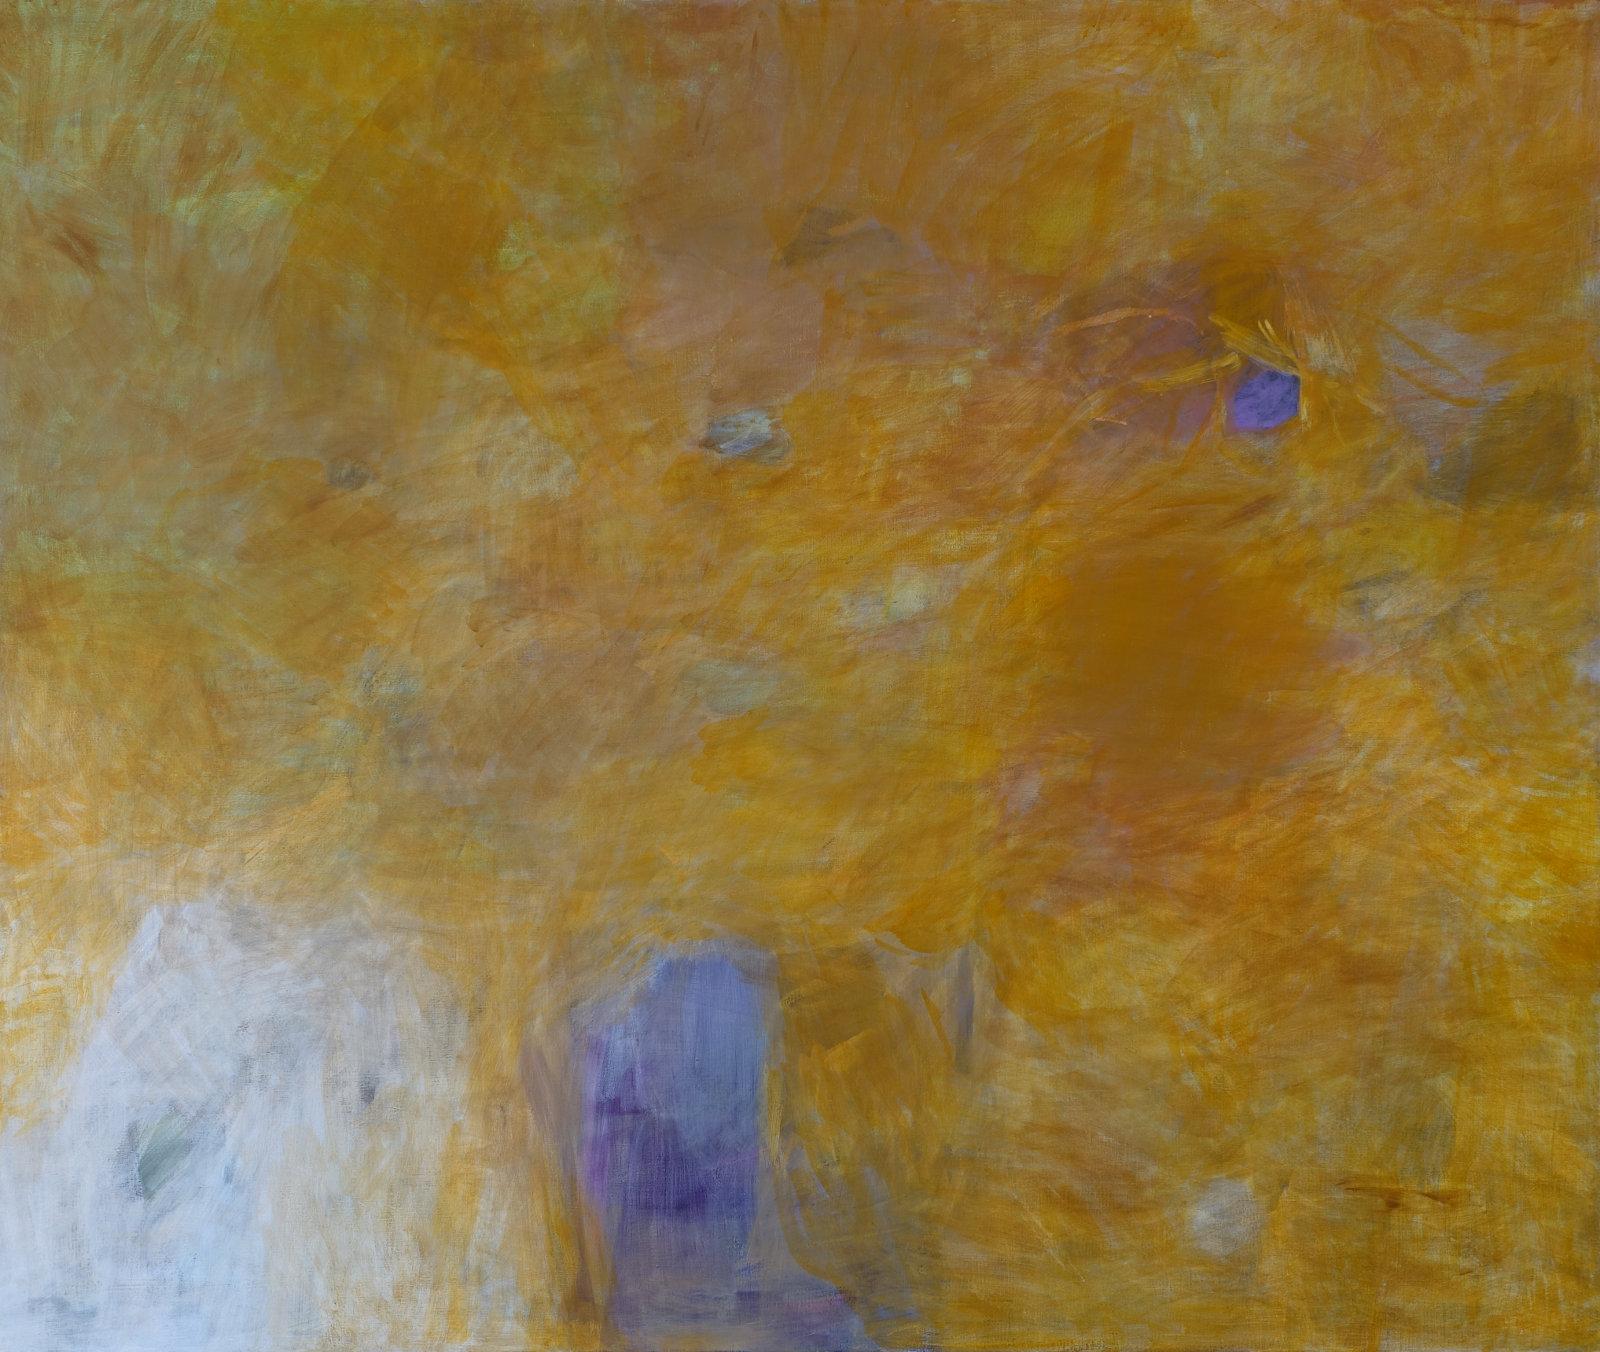 Uoma, 2018, tempera, 100 x 110 cm